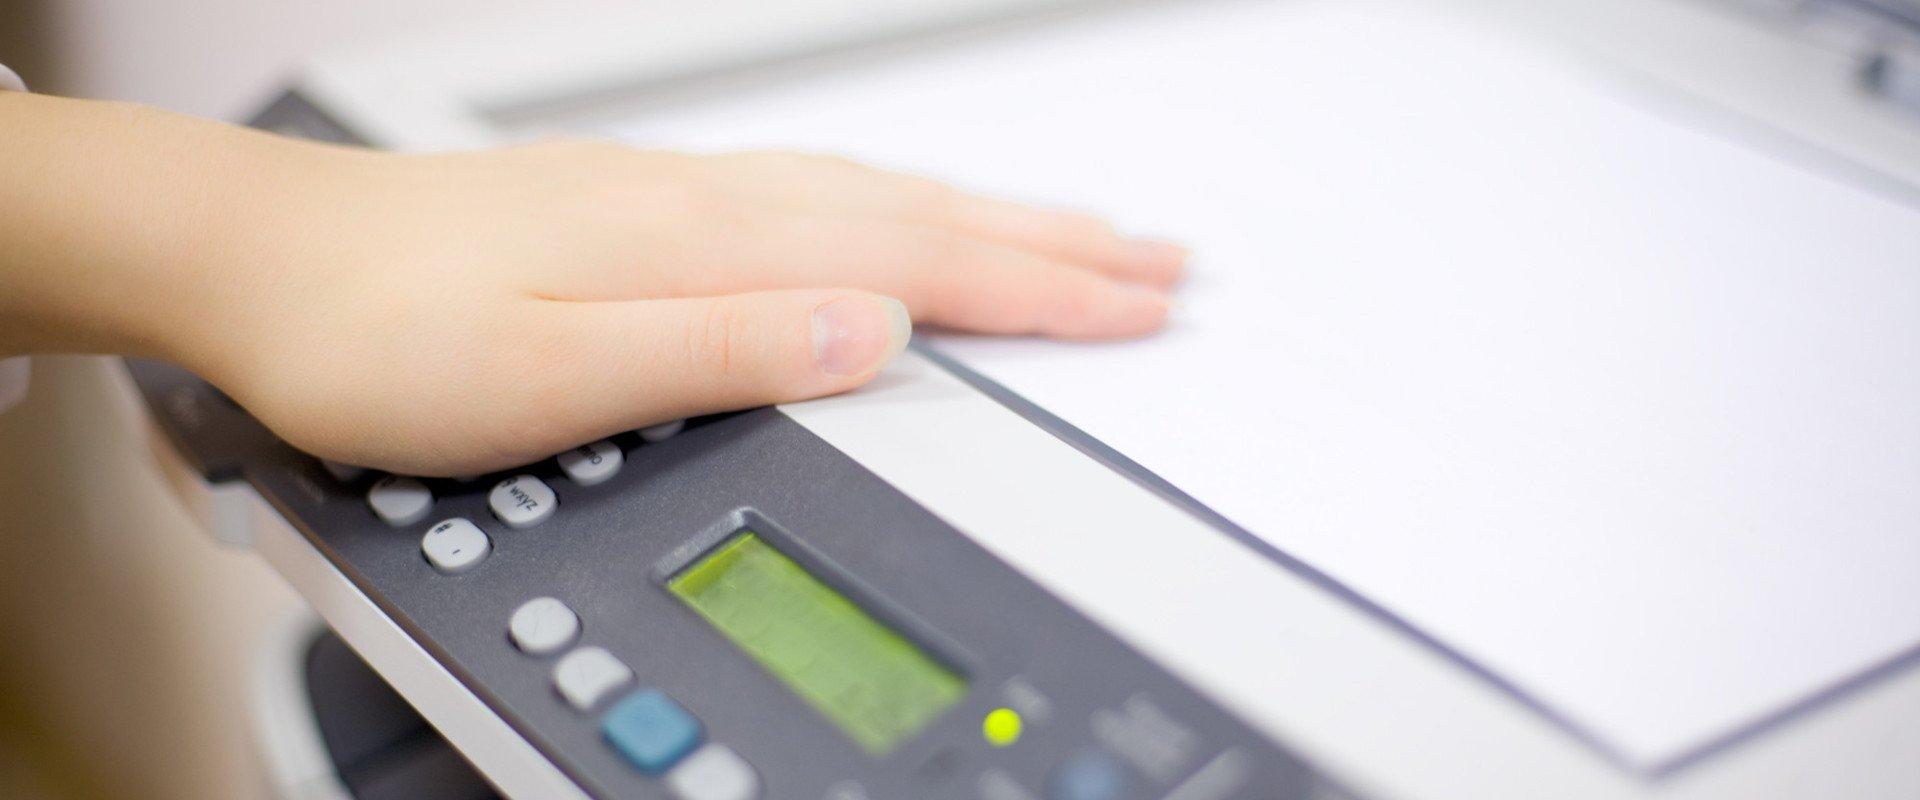 photocopy machine screen